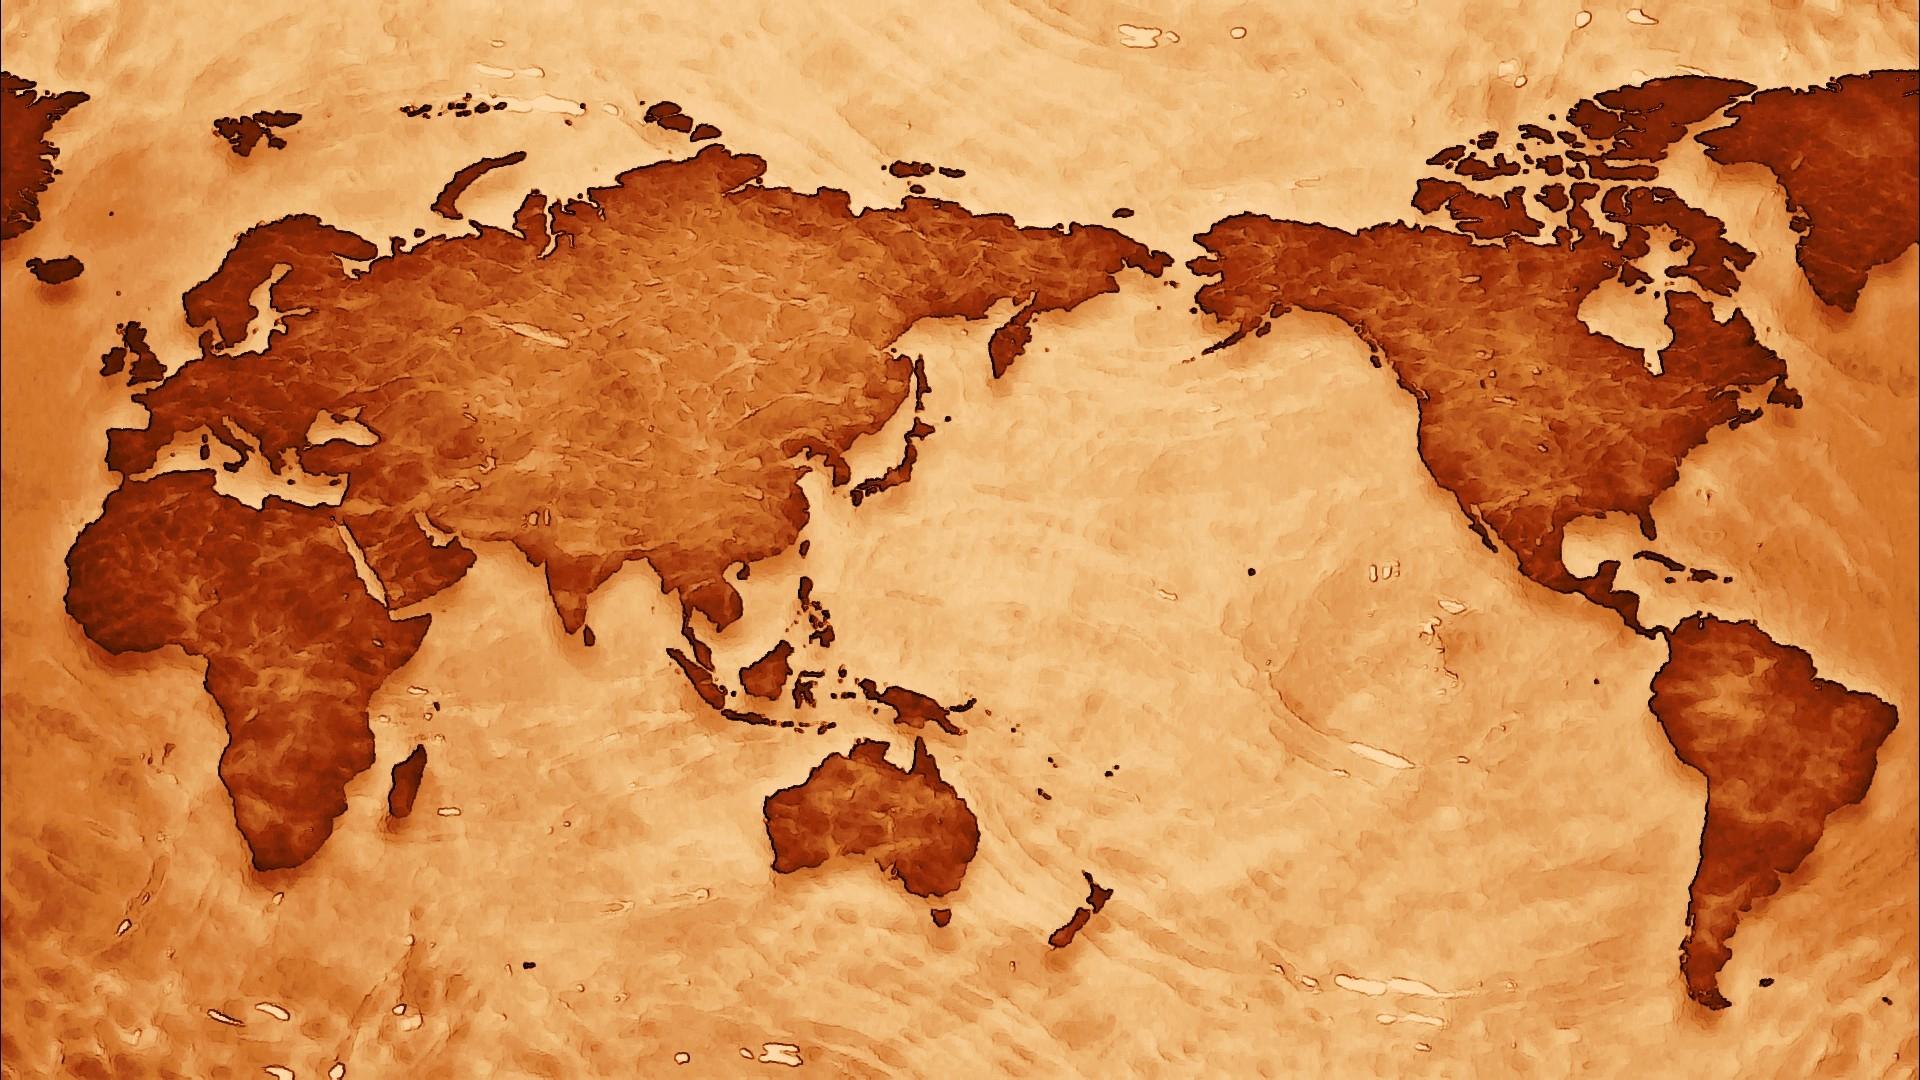 6970392-old-world-map-wallpaper.jpg